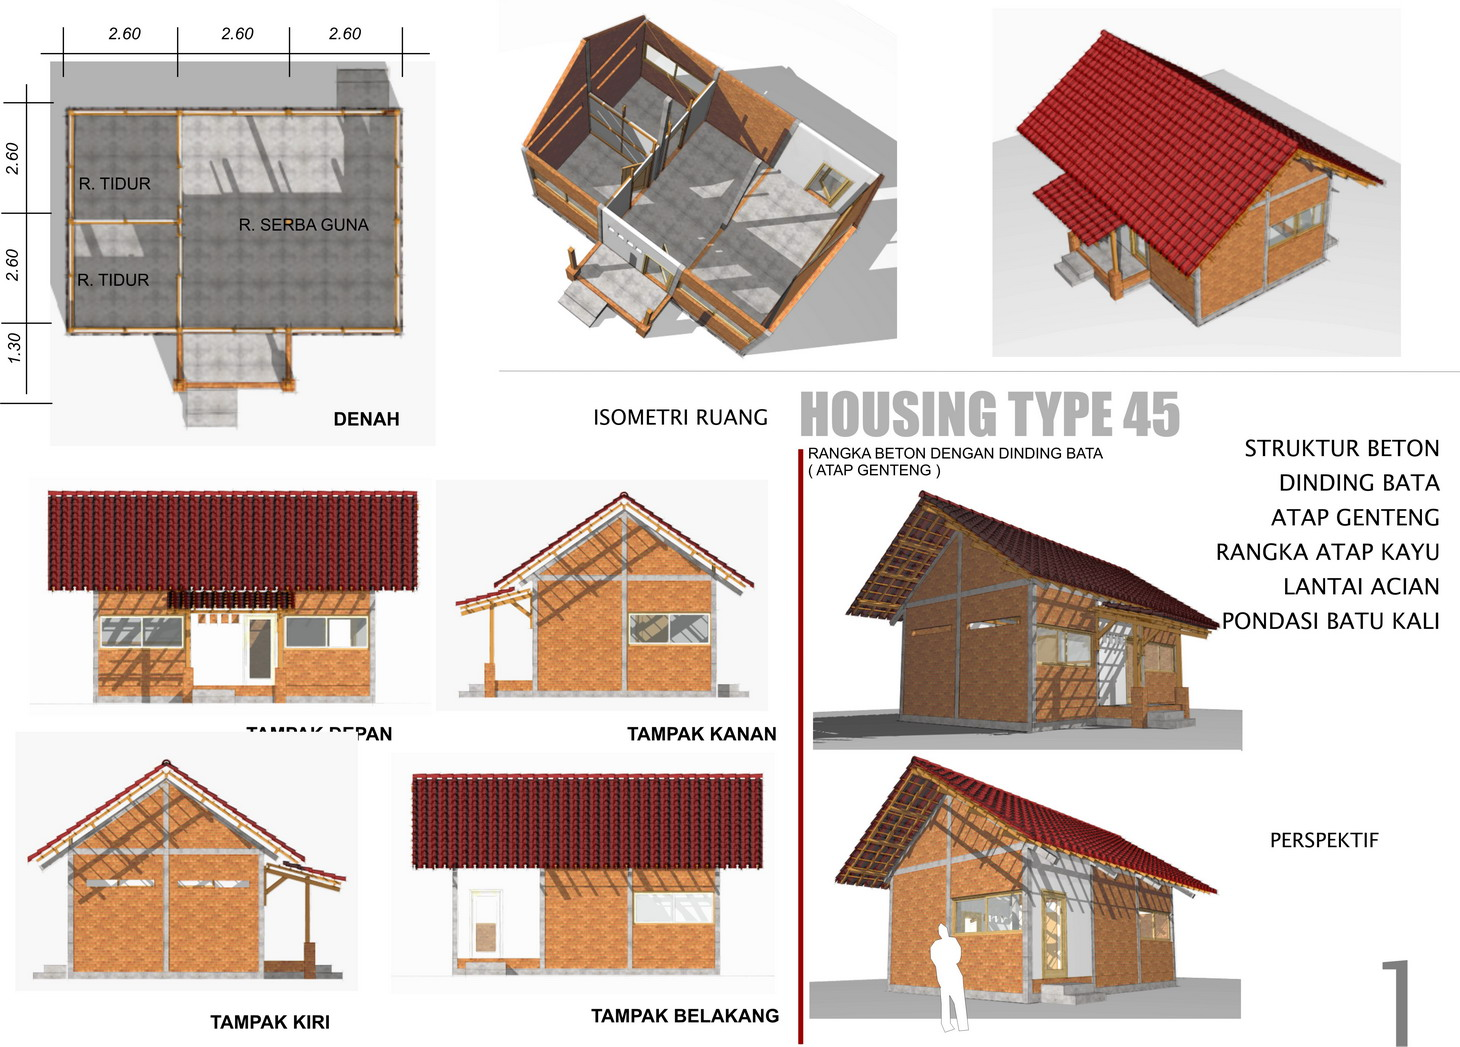 Berikut ada gambar rumah tahan gempa desain IAI Yogya.